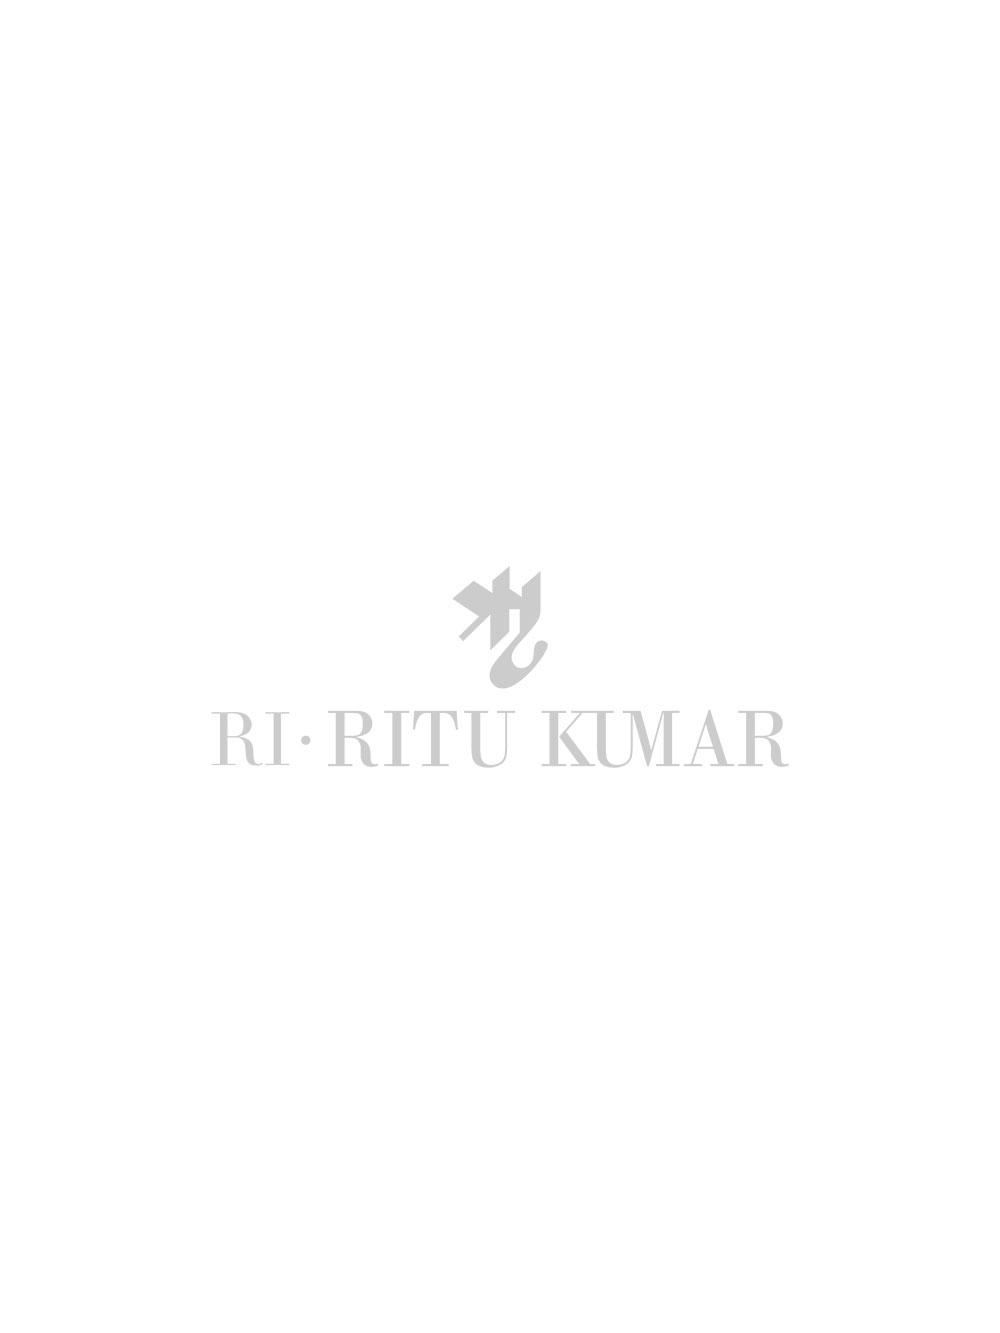 Off White & Indigo Embroidered Kurta With Dupatta And Churidar